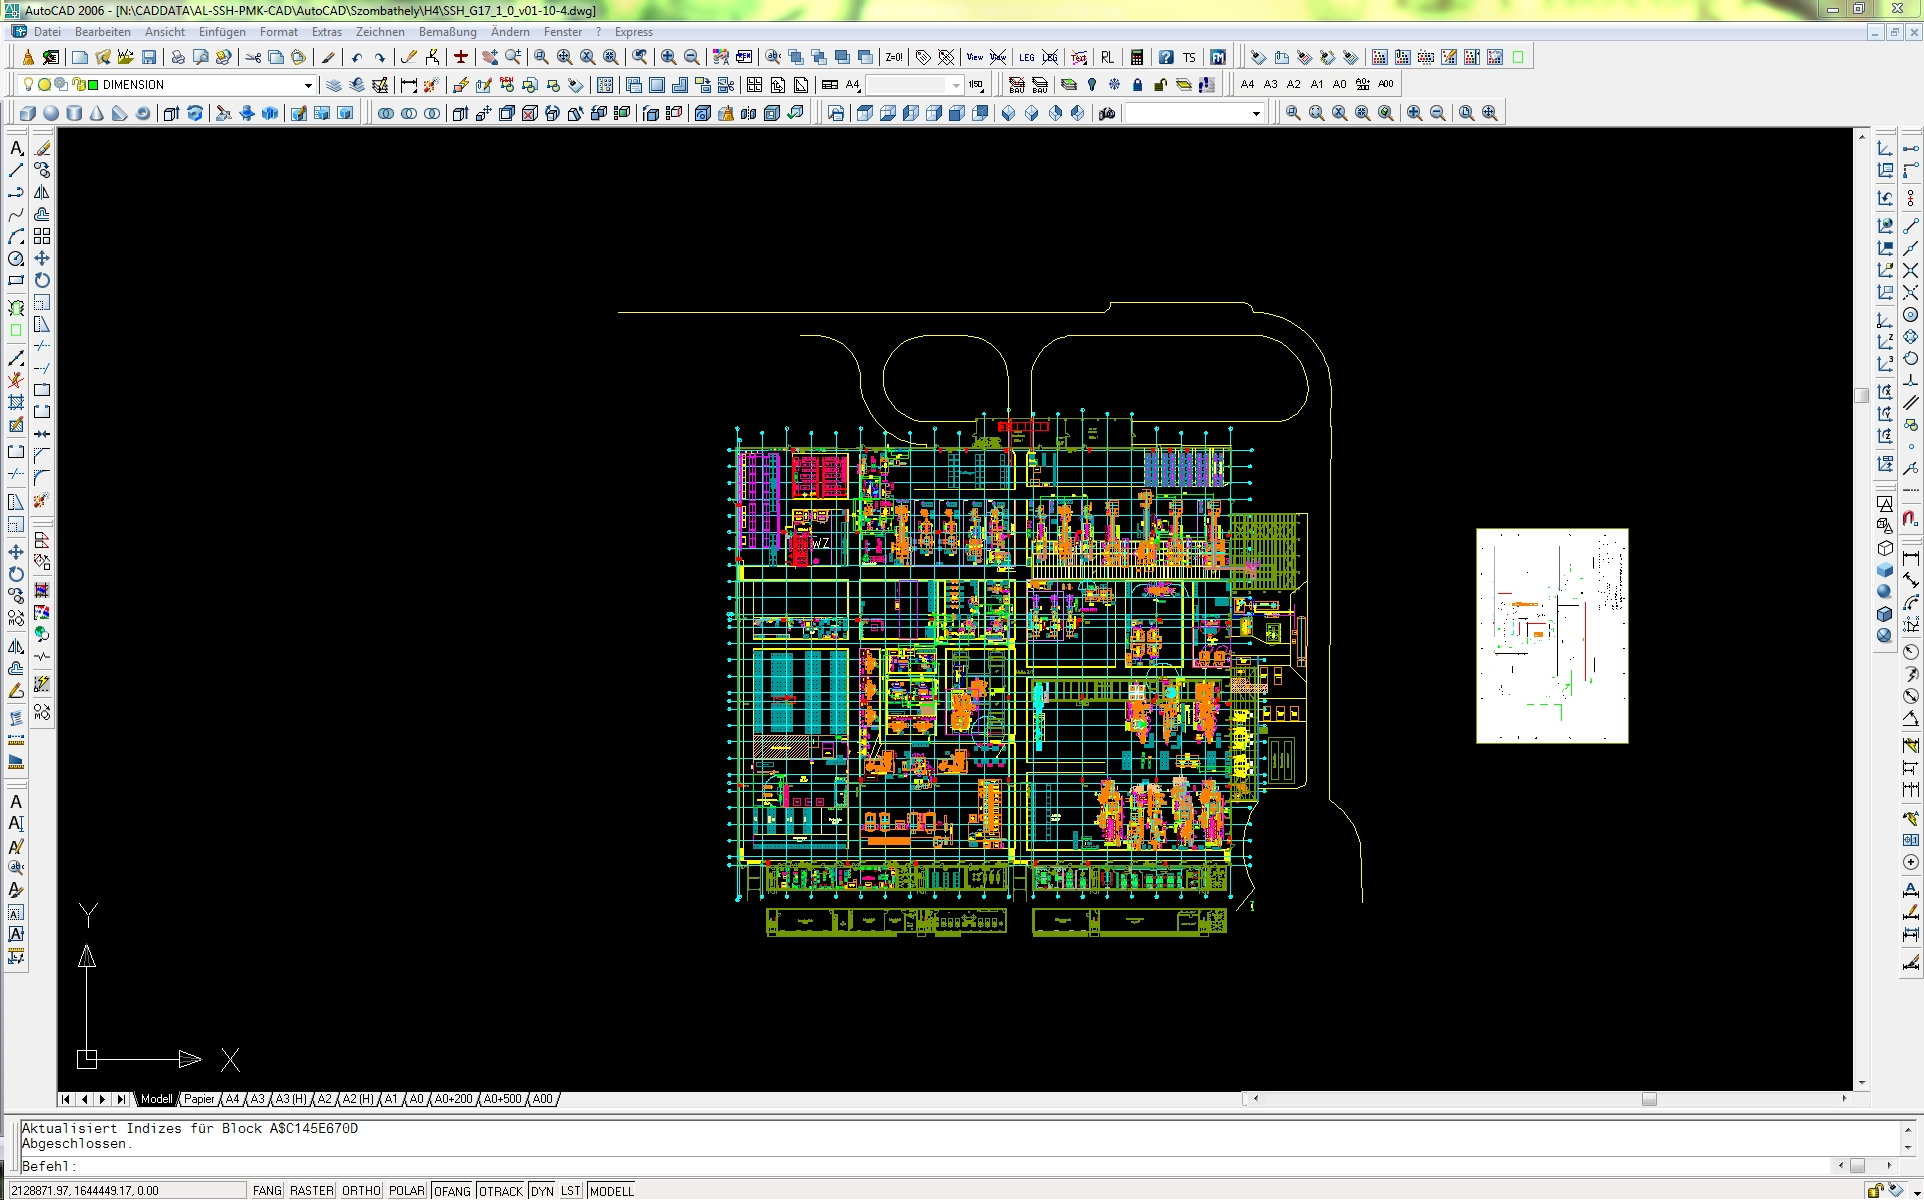 Solved: DWG Trueview 2013 shows block frames (DWG from